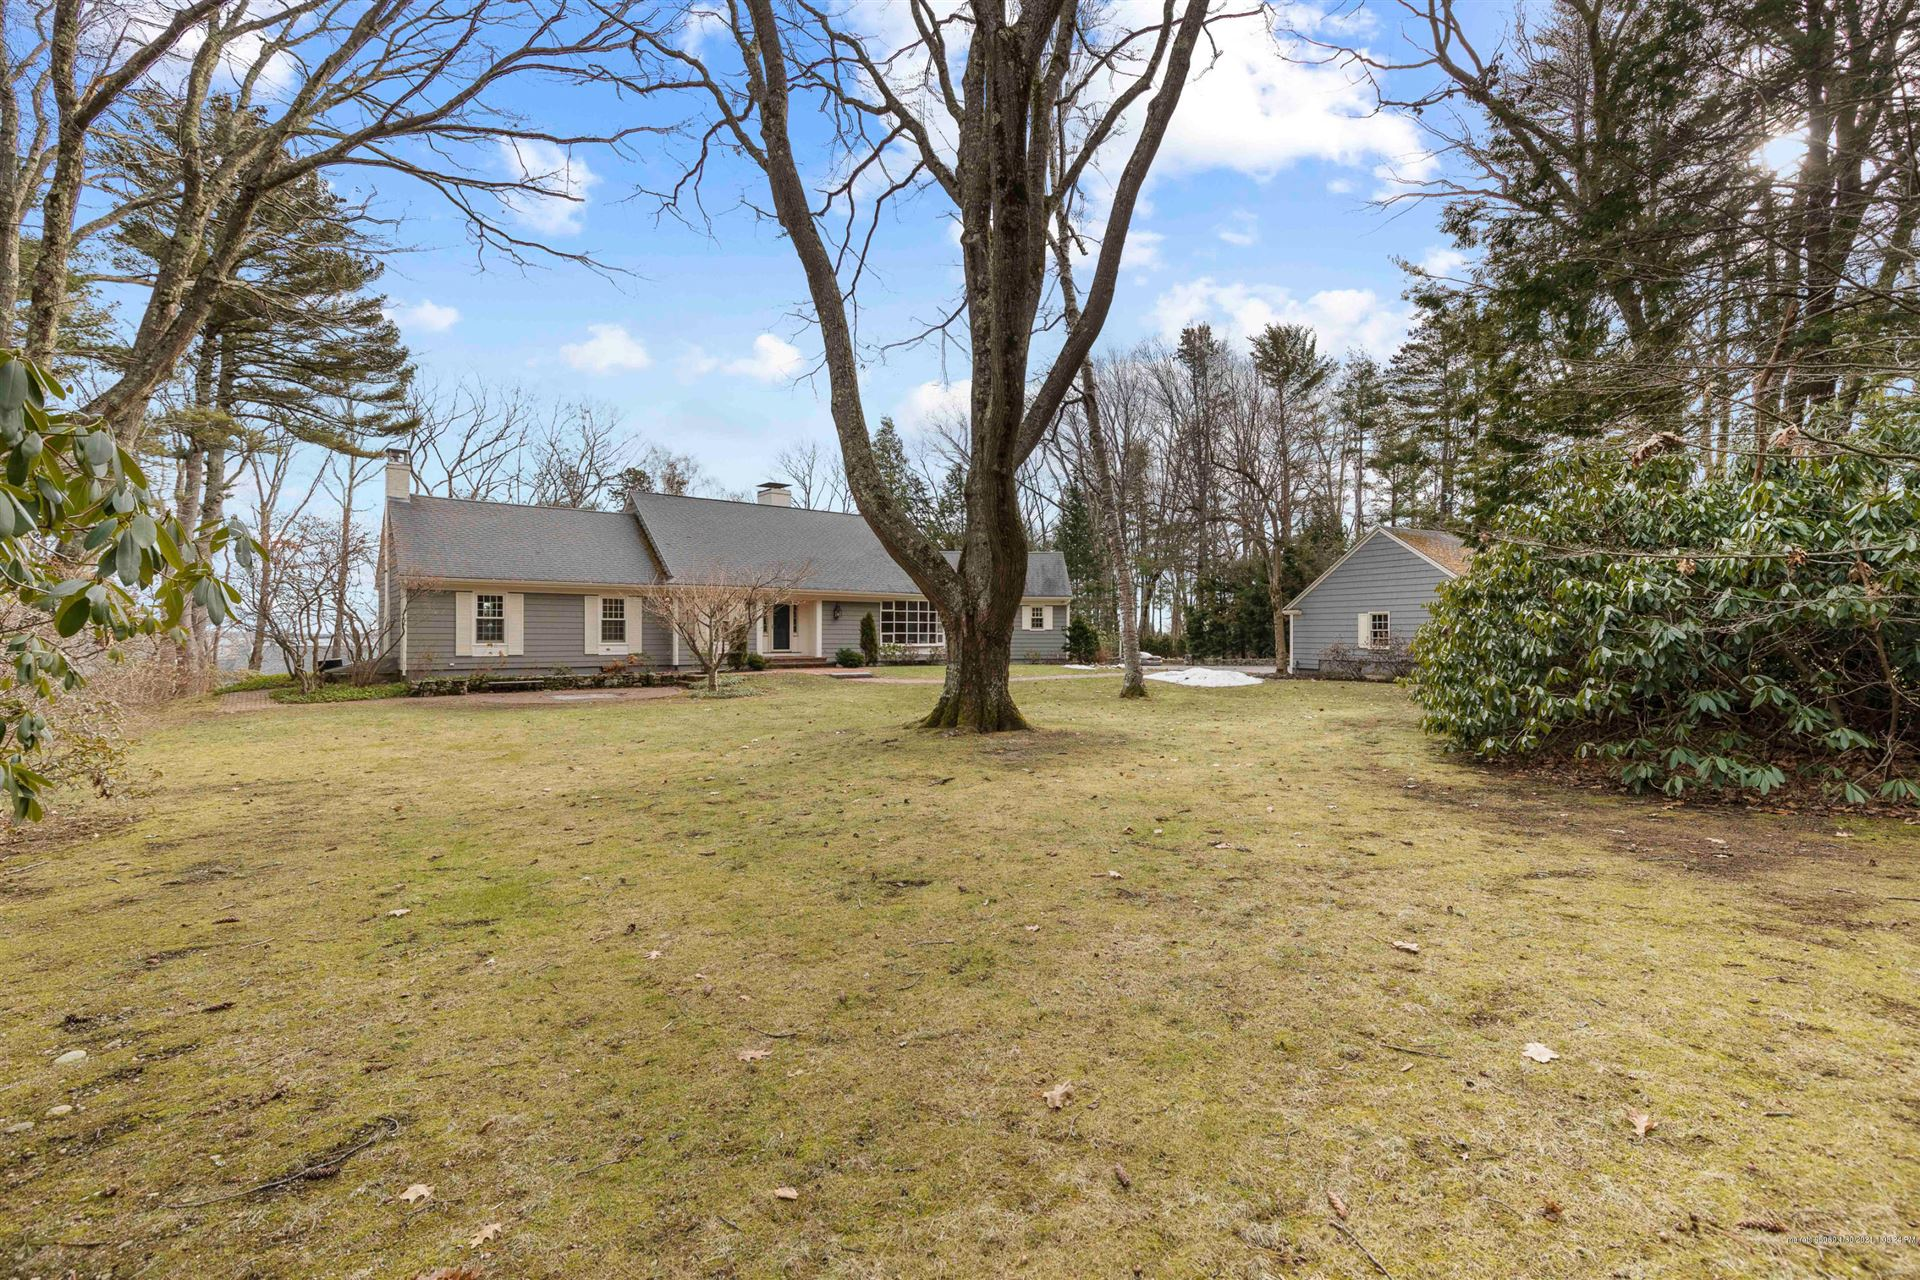 Photo of 10 Spruce Lane, Cumberland, ME 04110 (MLS # 1480581)